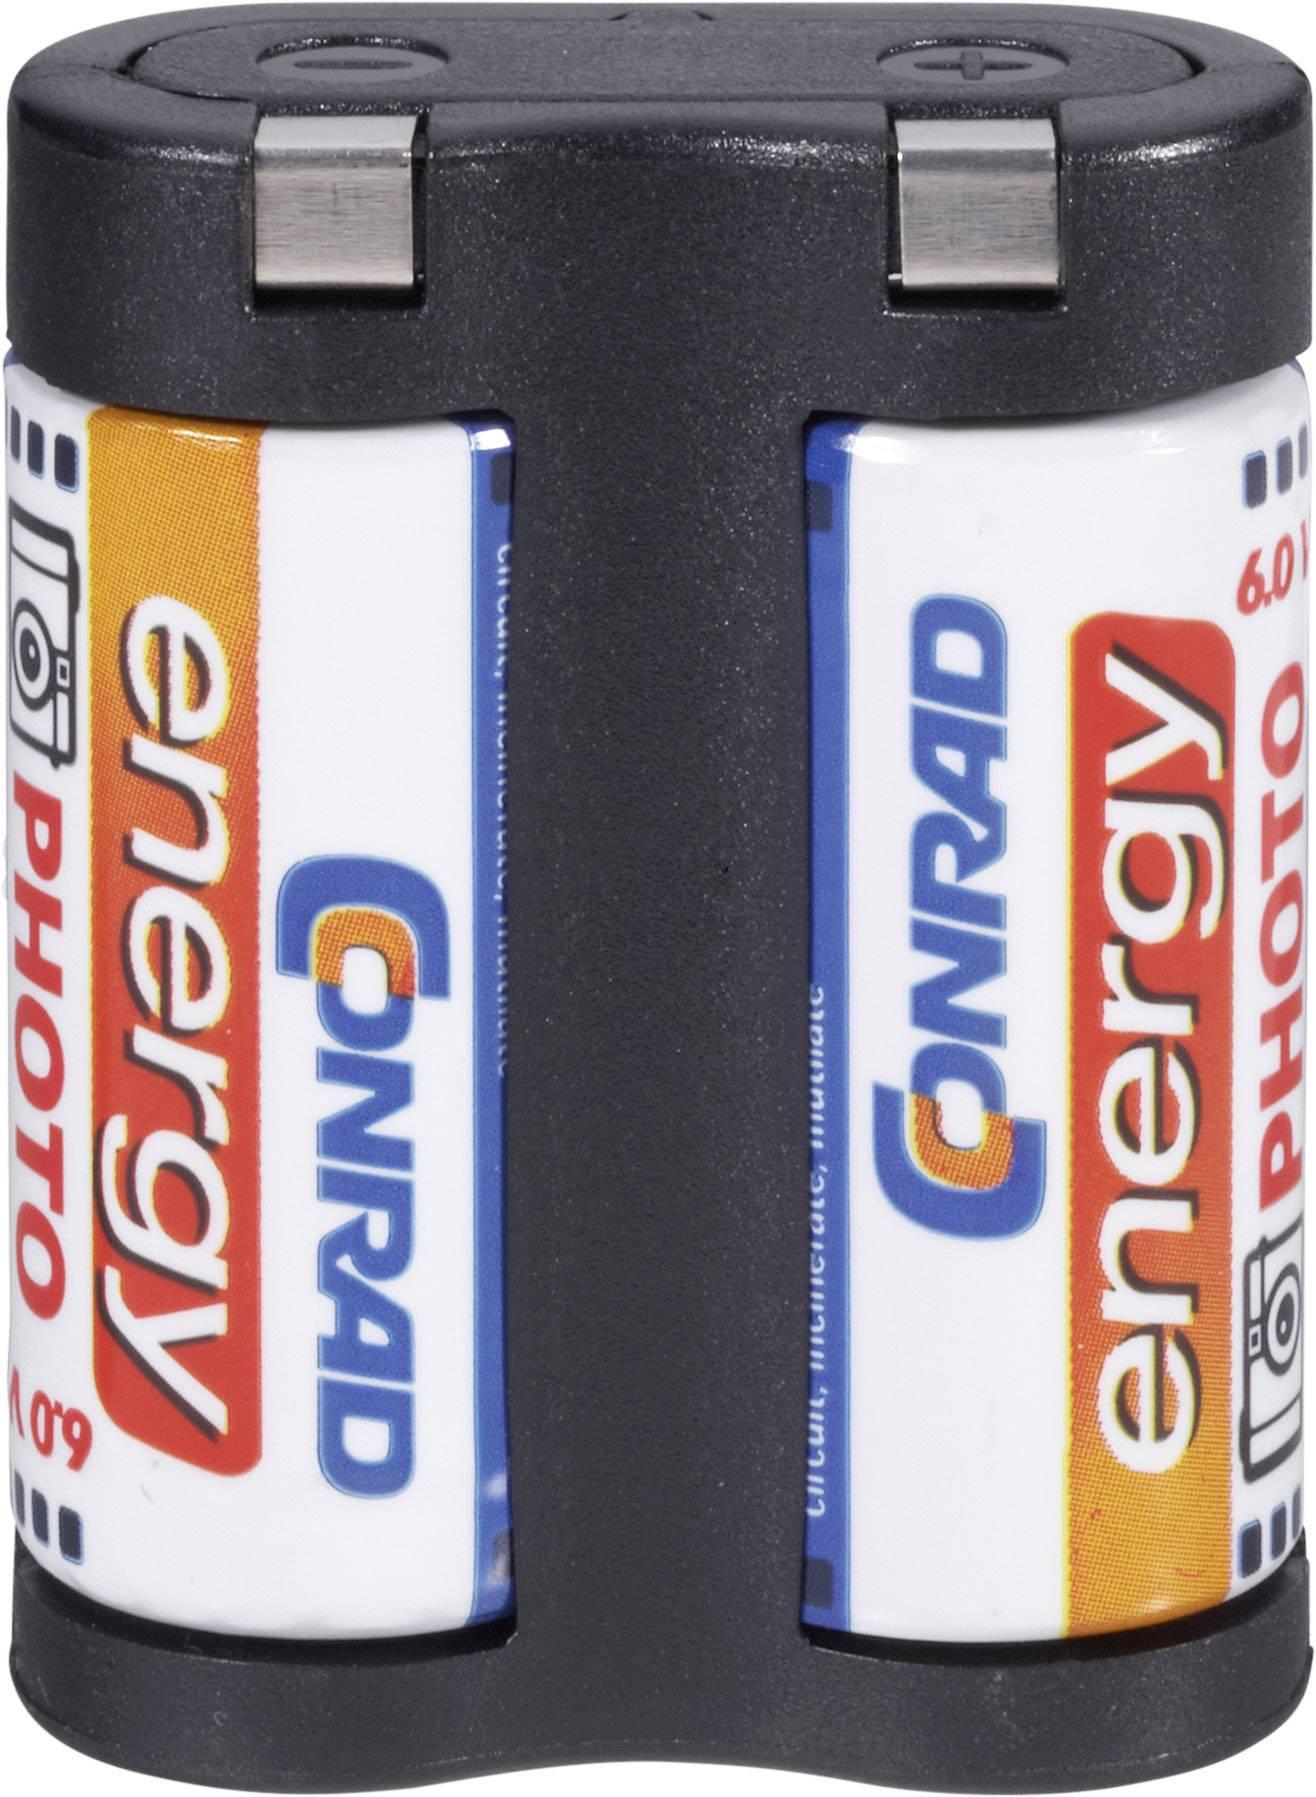 Conrad Energy lítiové foto batérie 2 CR 5